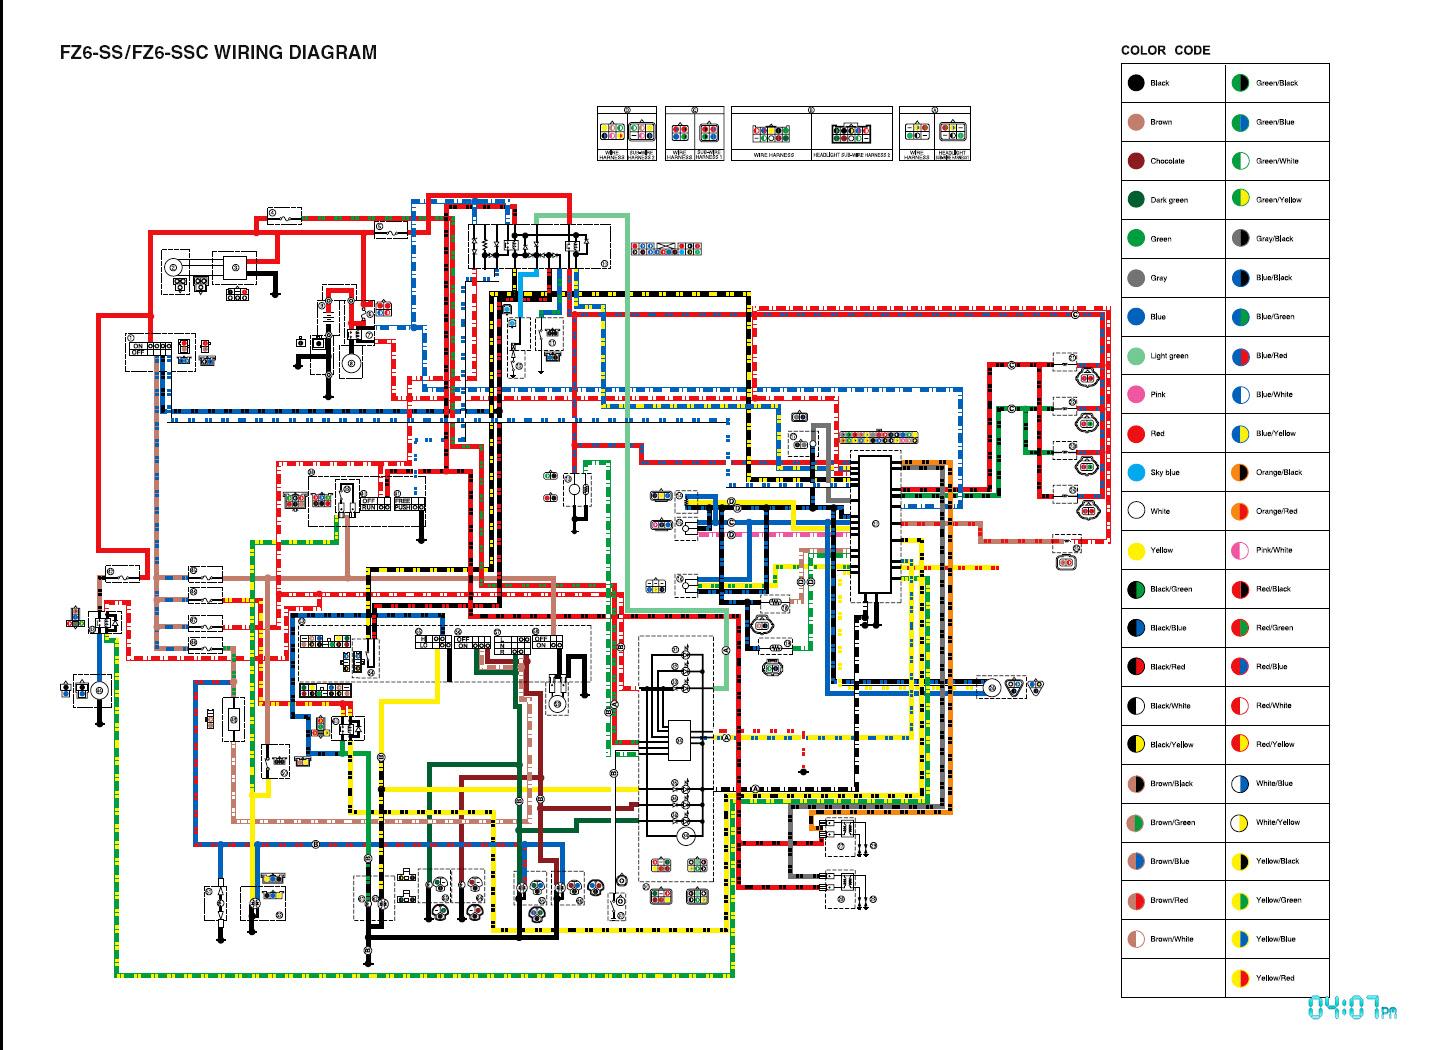 2003 Yamaha Fz1 Wiring Diagram Wiring Diagram Girl Pair A Girl Pair A Zaafran It